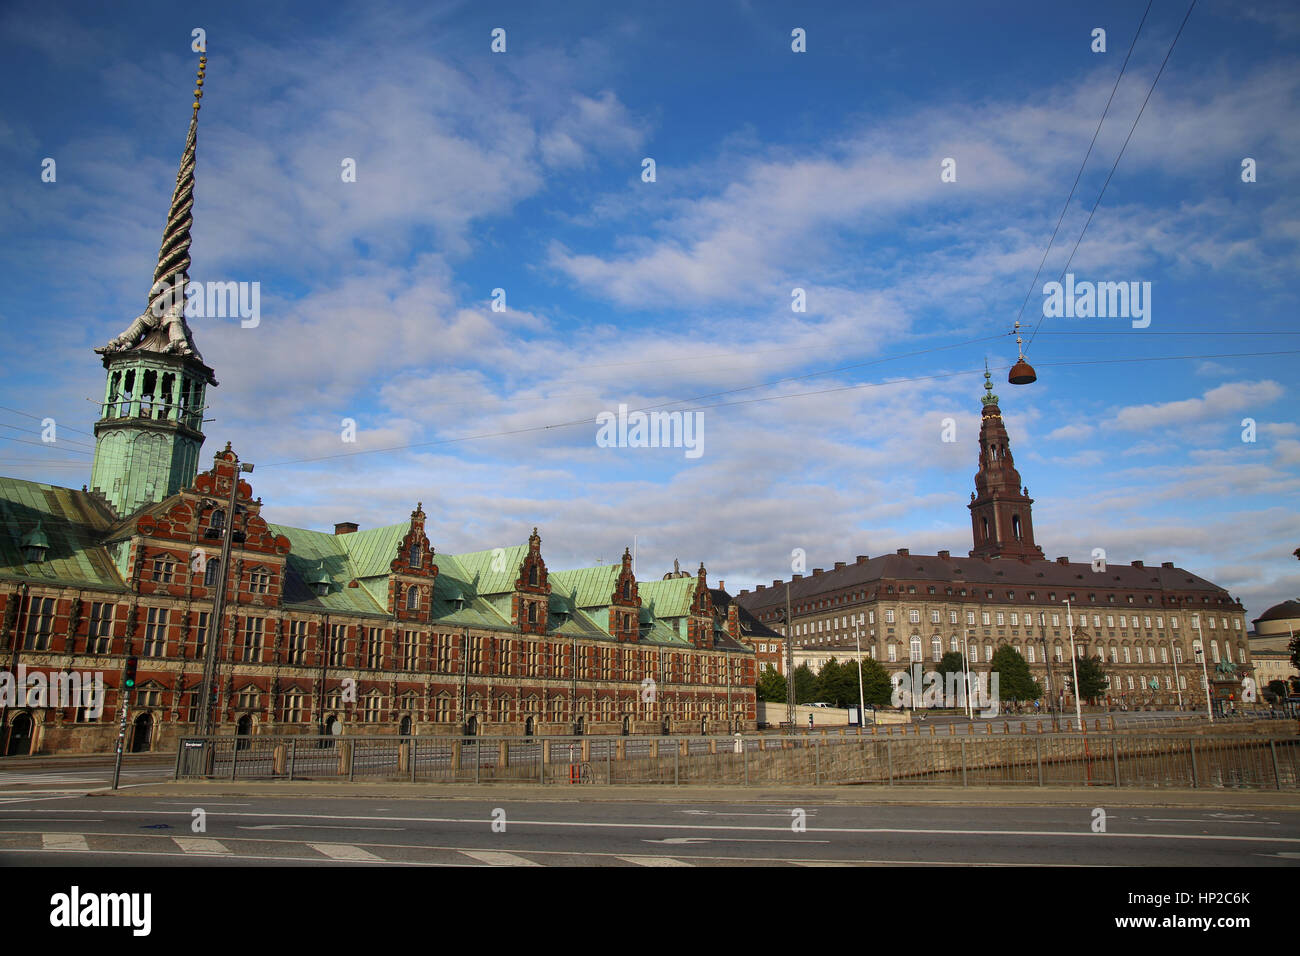 Morning view on Christiansborg Palace and The Borsen, Oldest Building in Slotsholmen, Copenhagen, Denmark - Stock Image